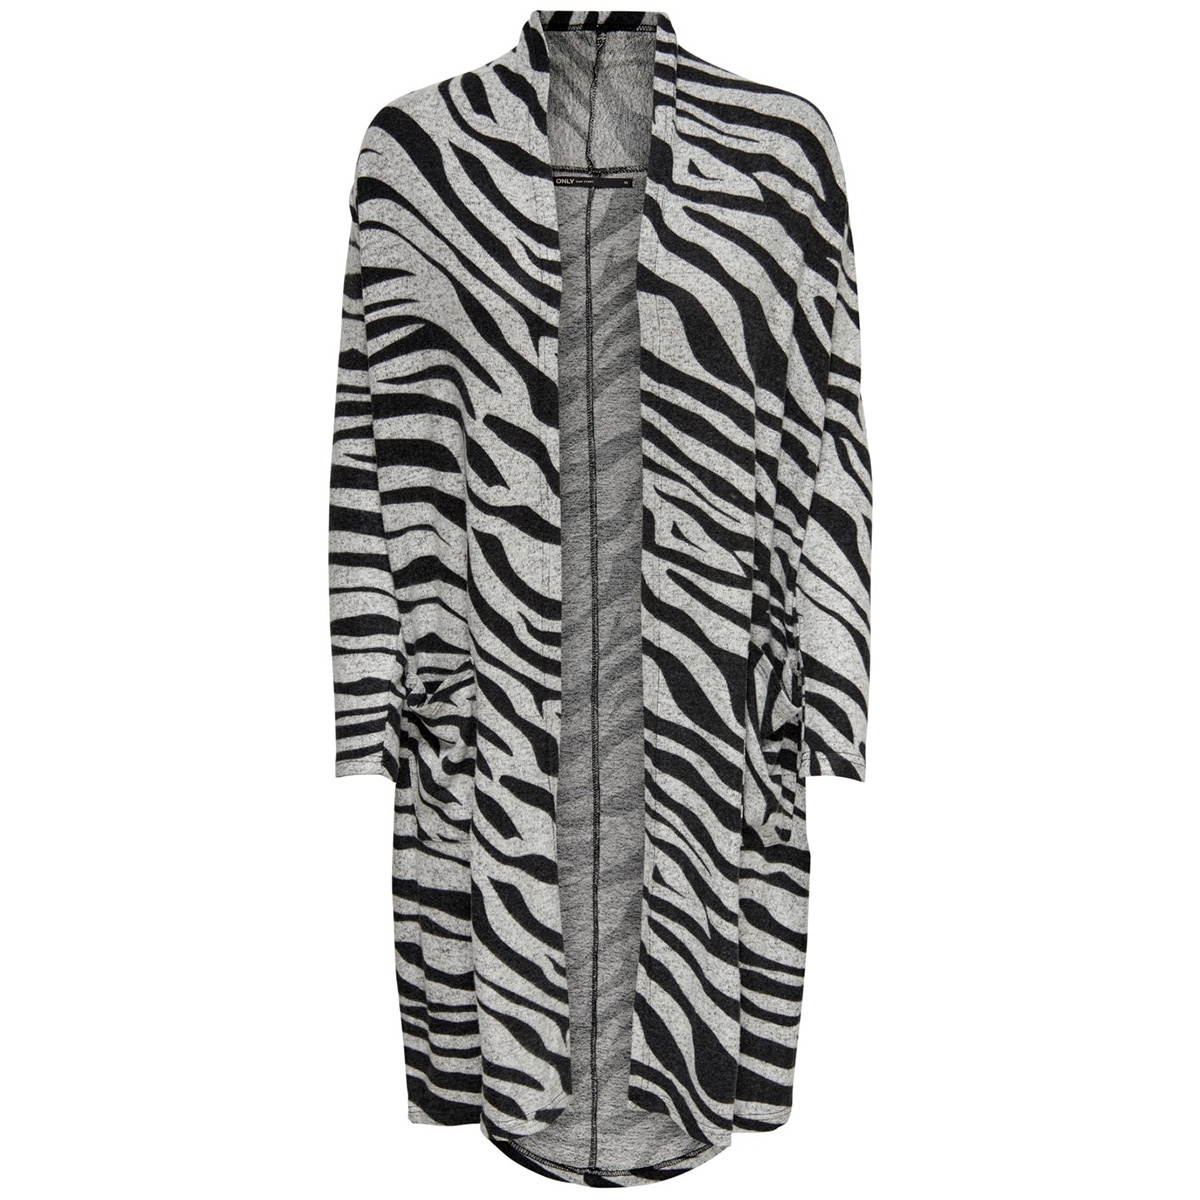 onlnew maye l/s cardigan box cc knt 15179826 only vest light grey mela/w. zebra